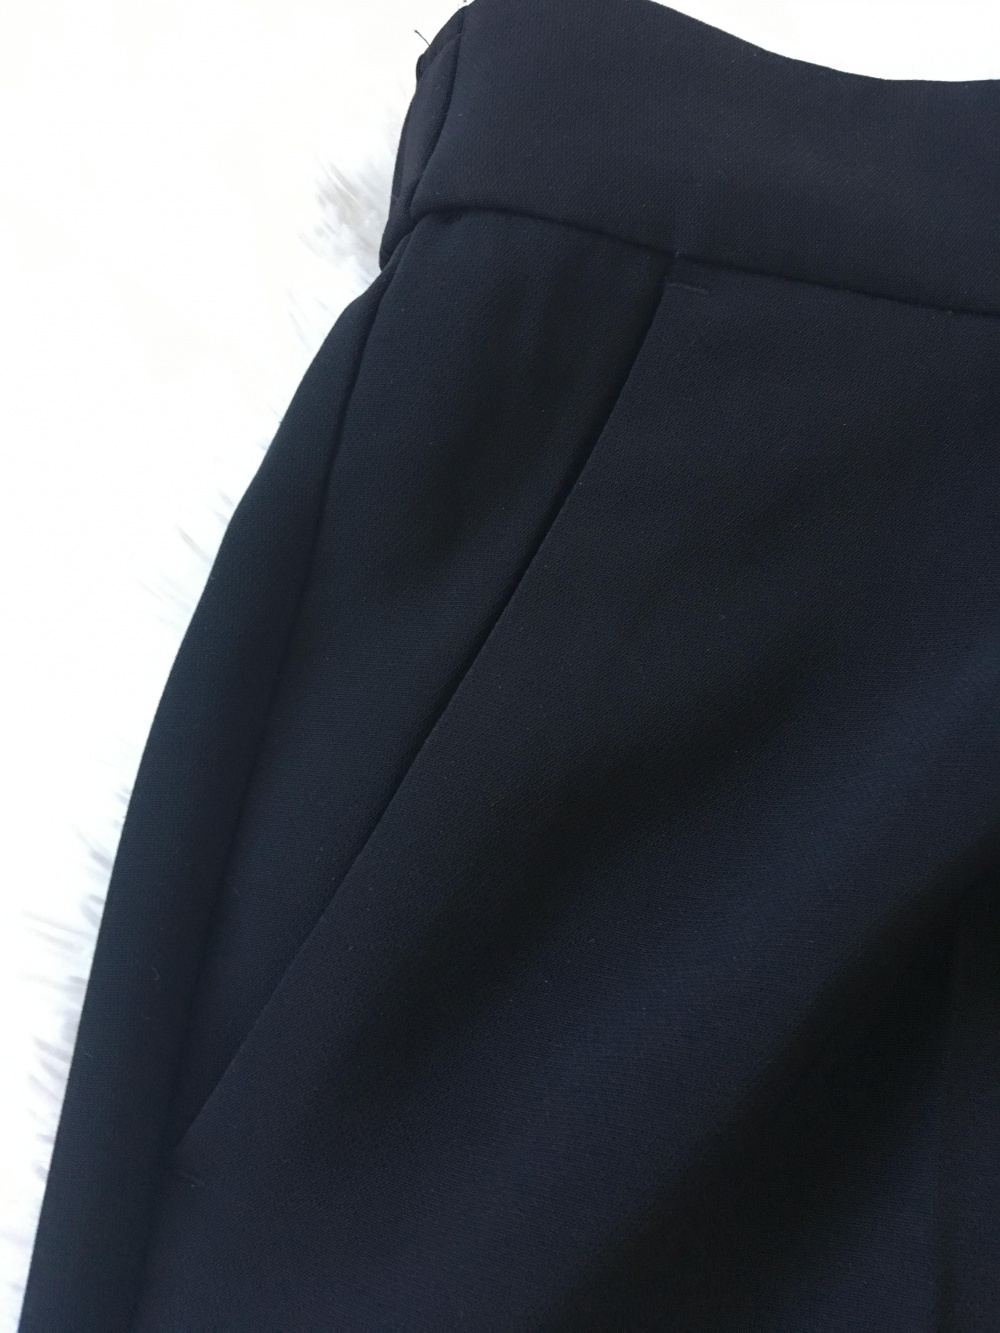 Брюки H&M, размер S